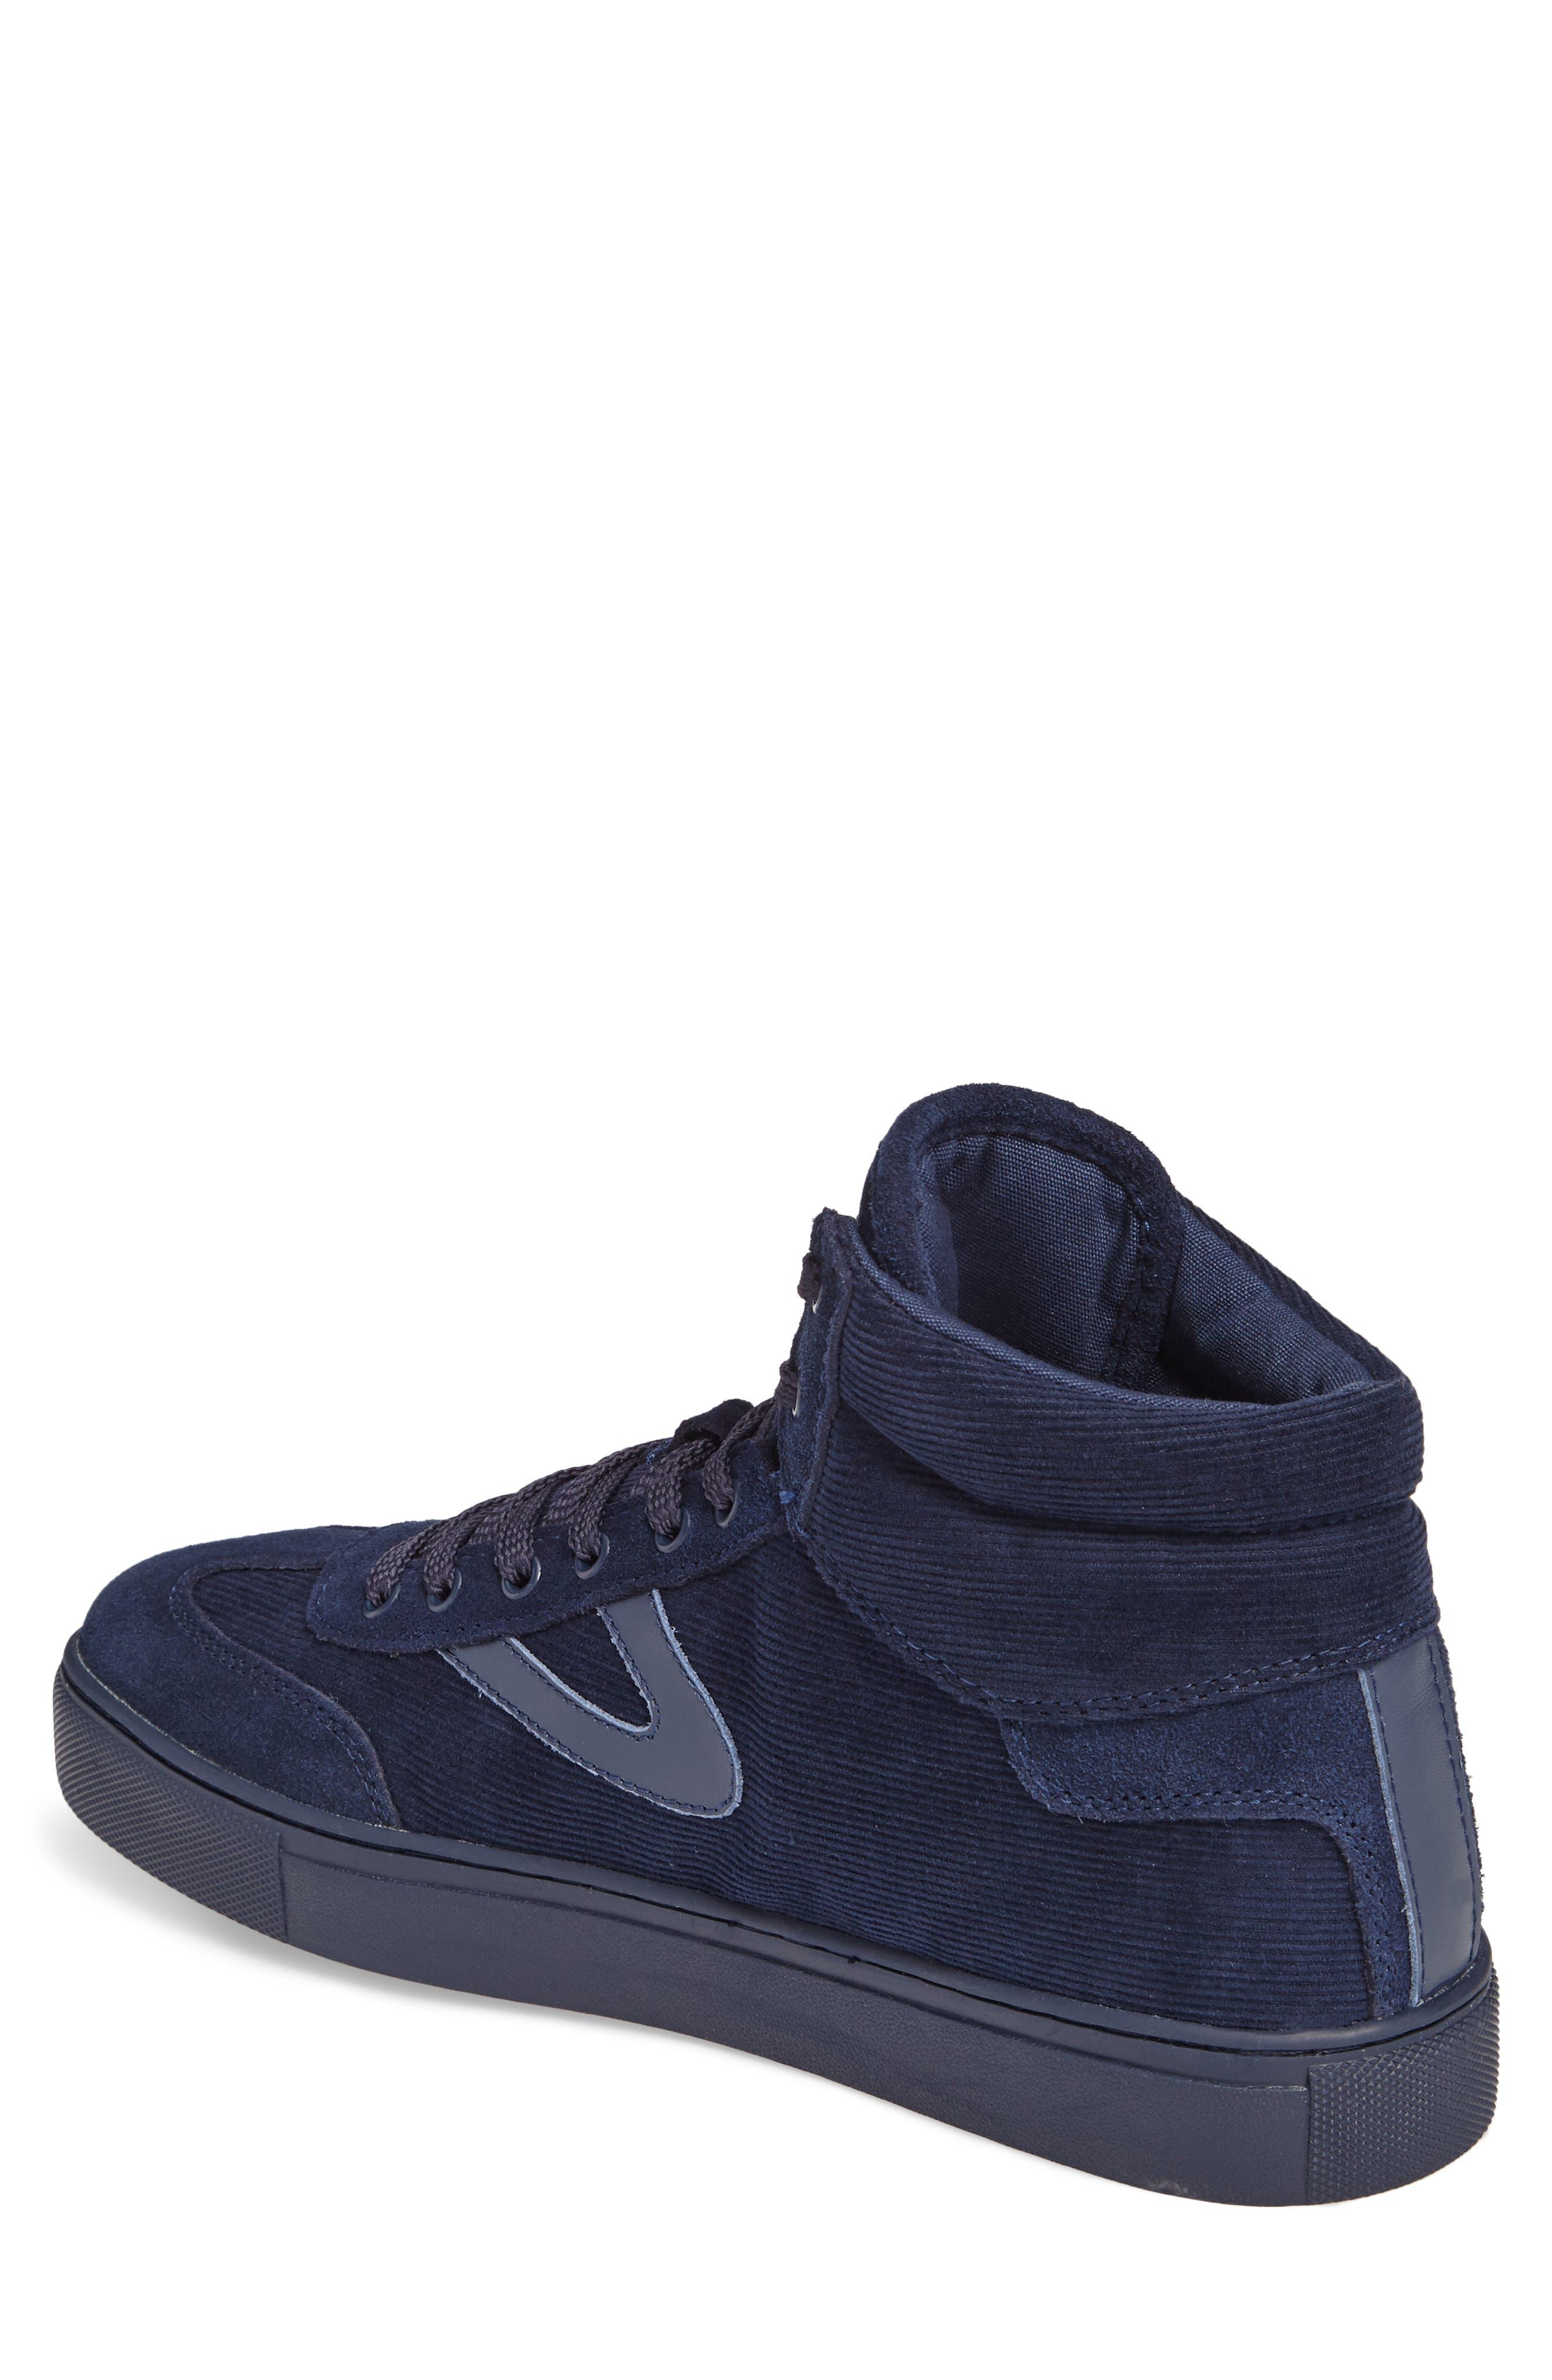 Jack High Top Sneaker,                             Alternate thumbnail 4, color,